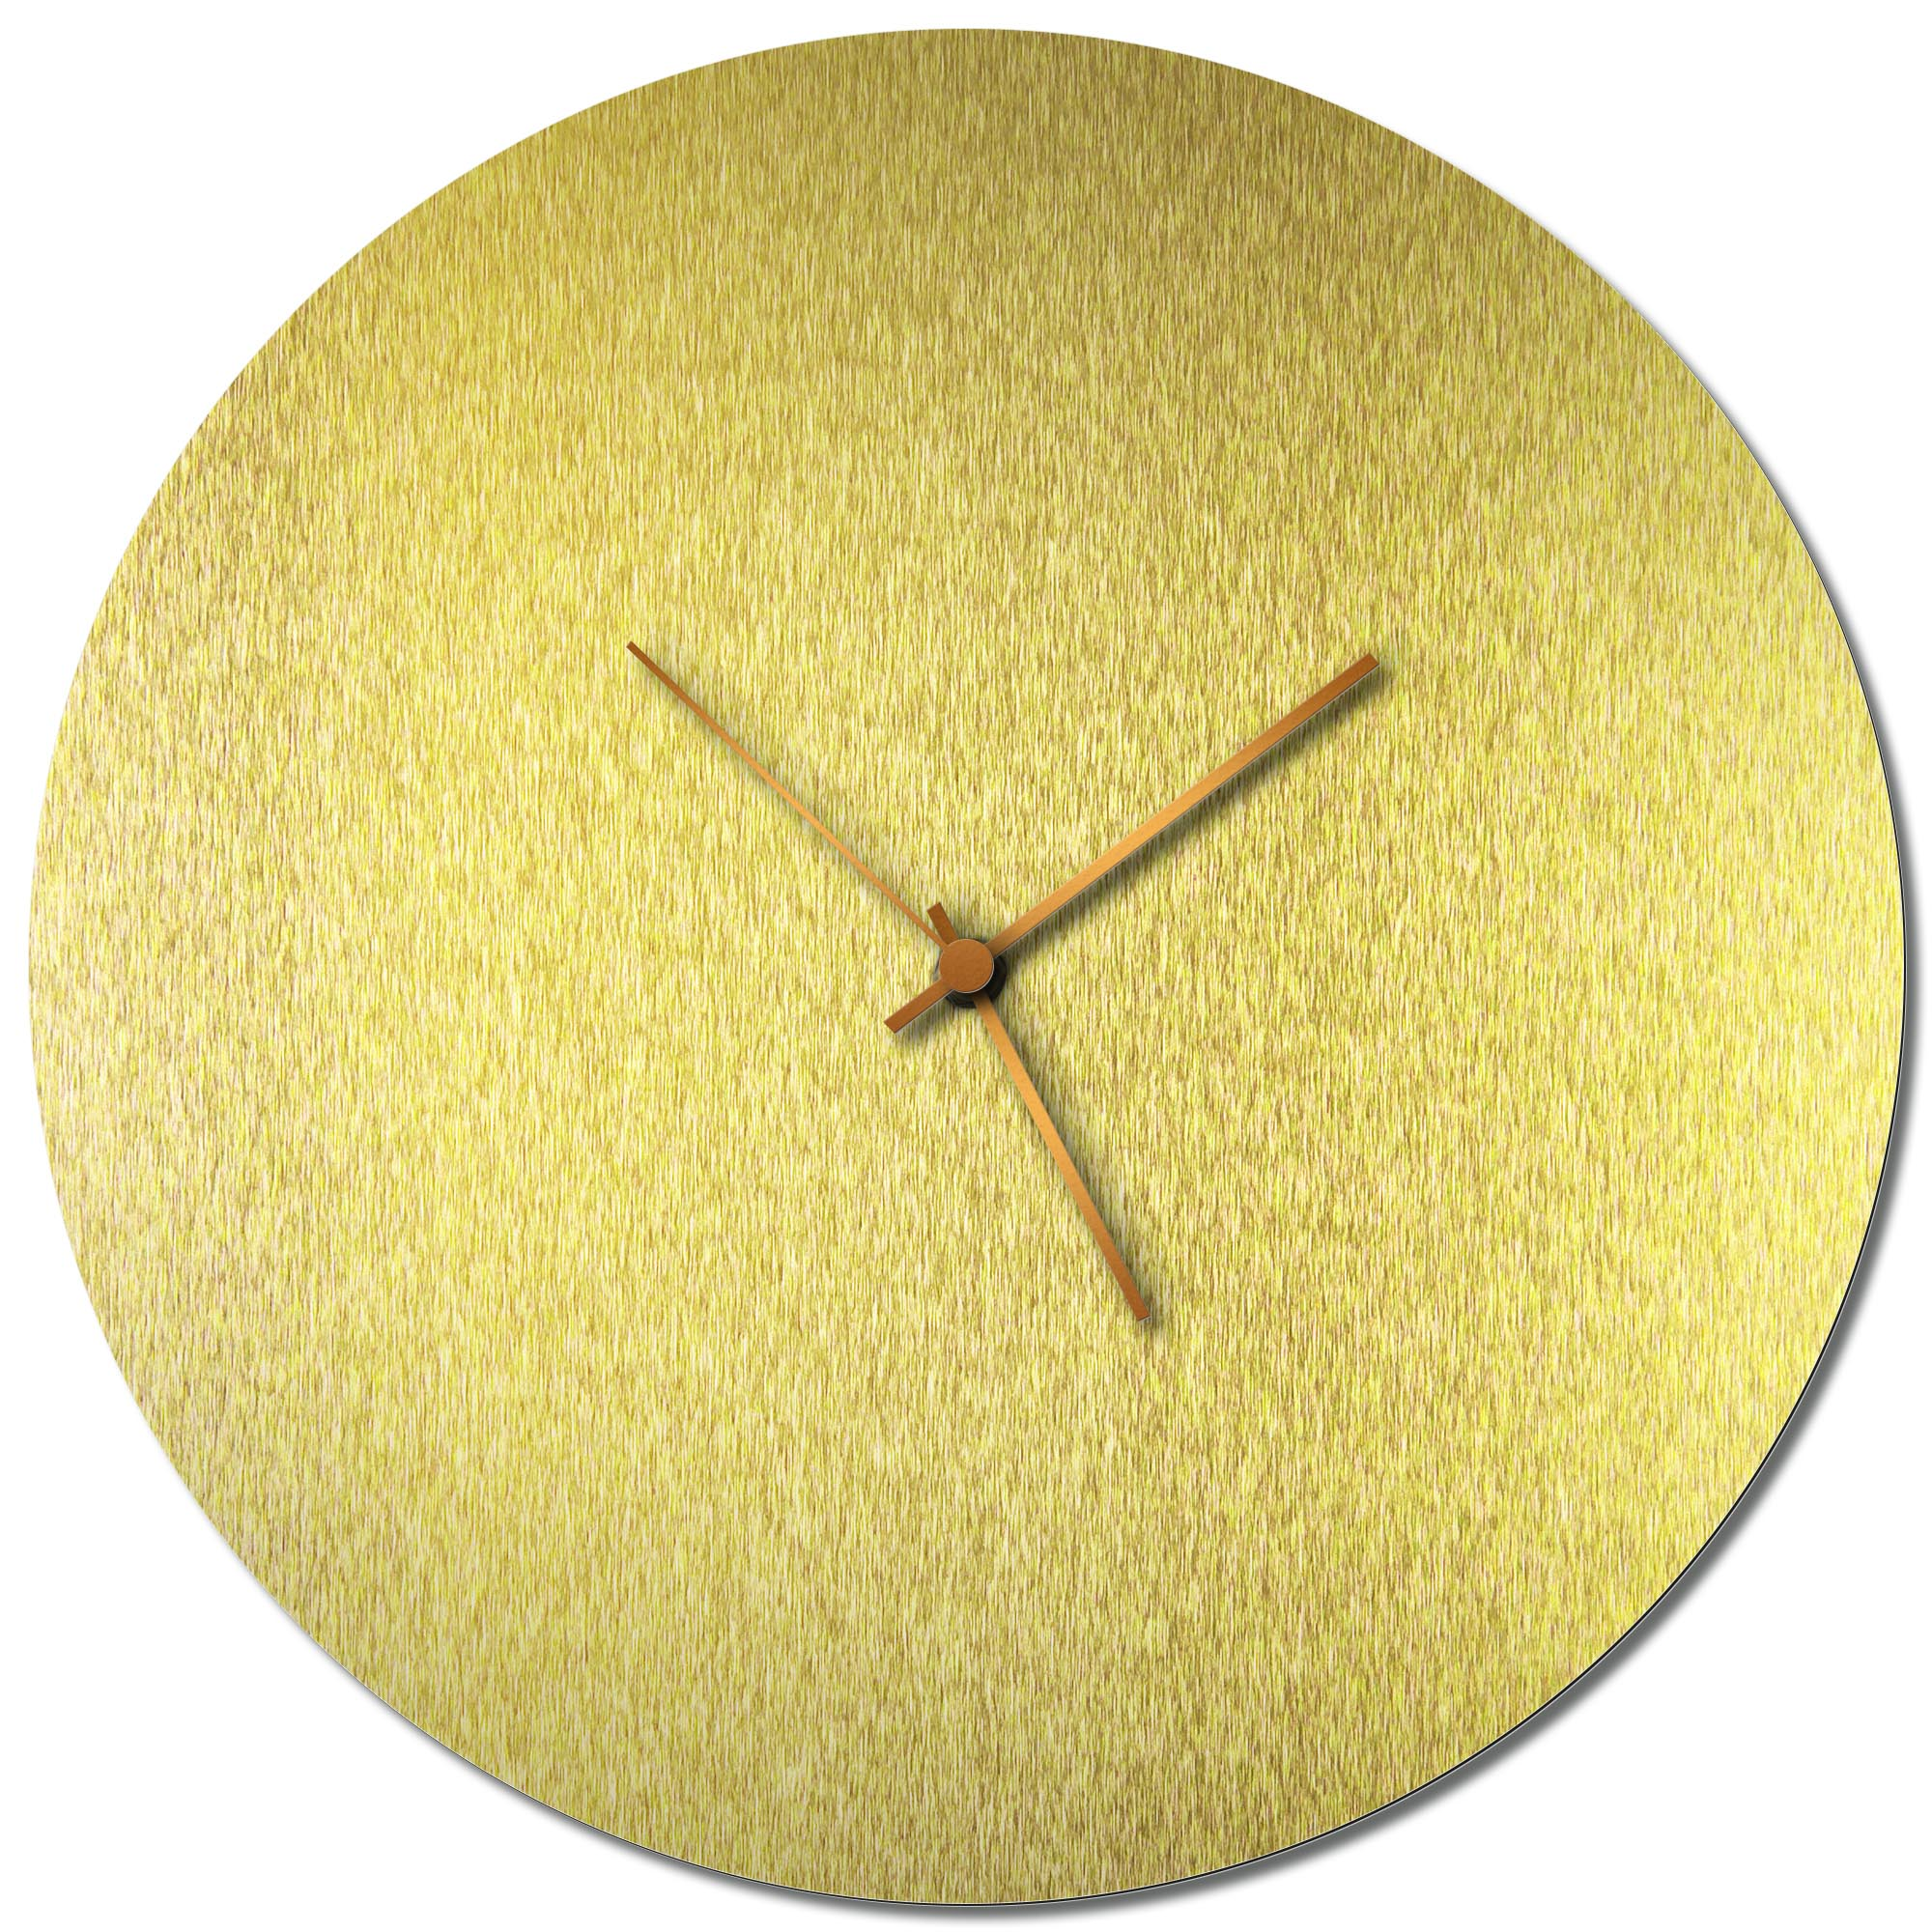 Adam Schwoeppe 'Goldsmith Circle Clock Bronze' Midcentury Modern Style Wall Clock